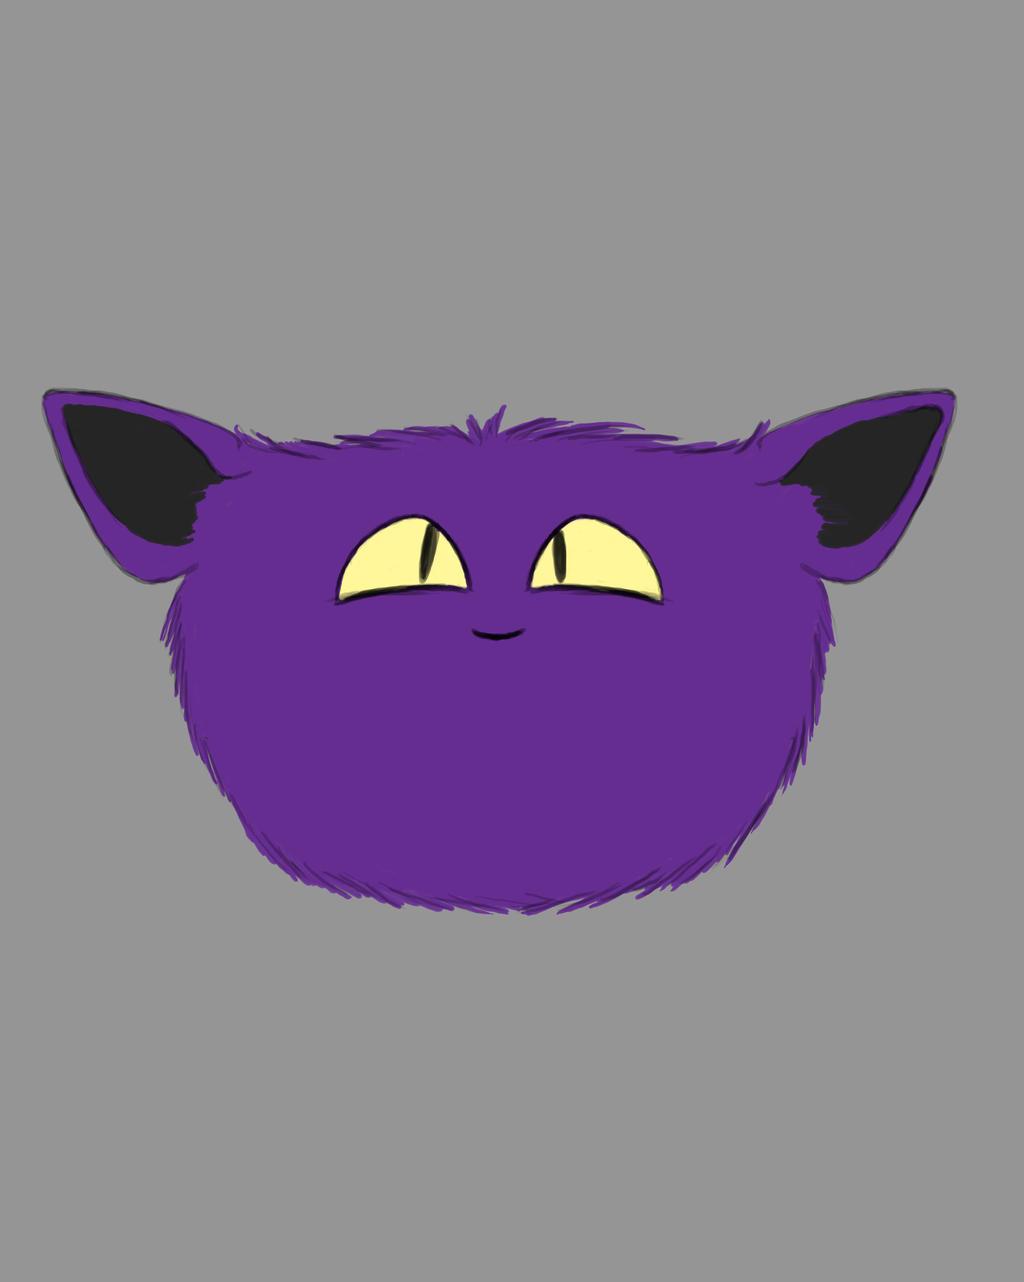 Purple Fluff Daily sketch #662 by GothicVampireFreak